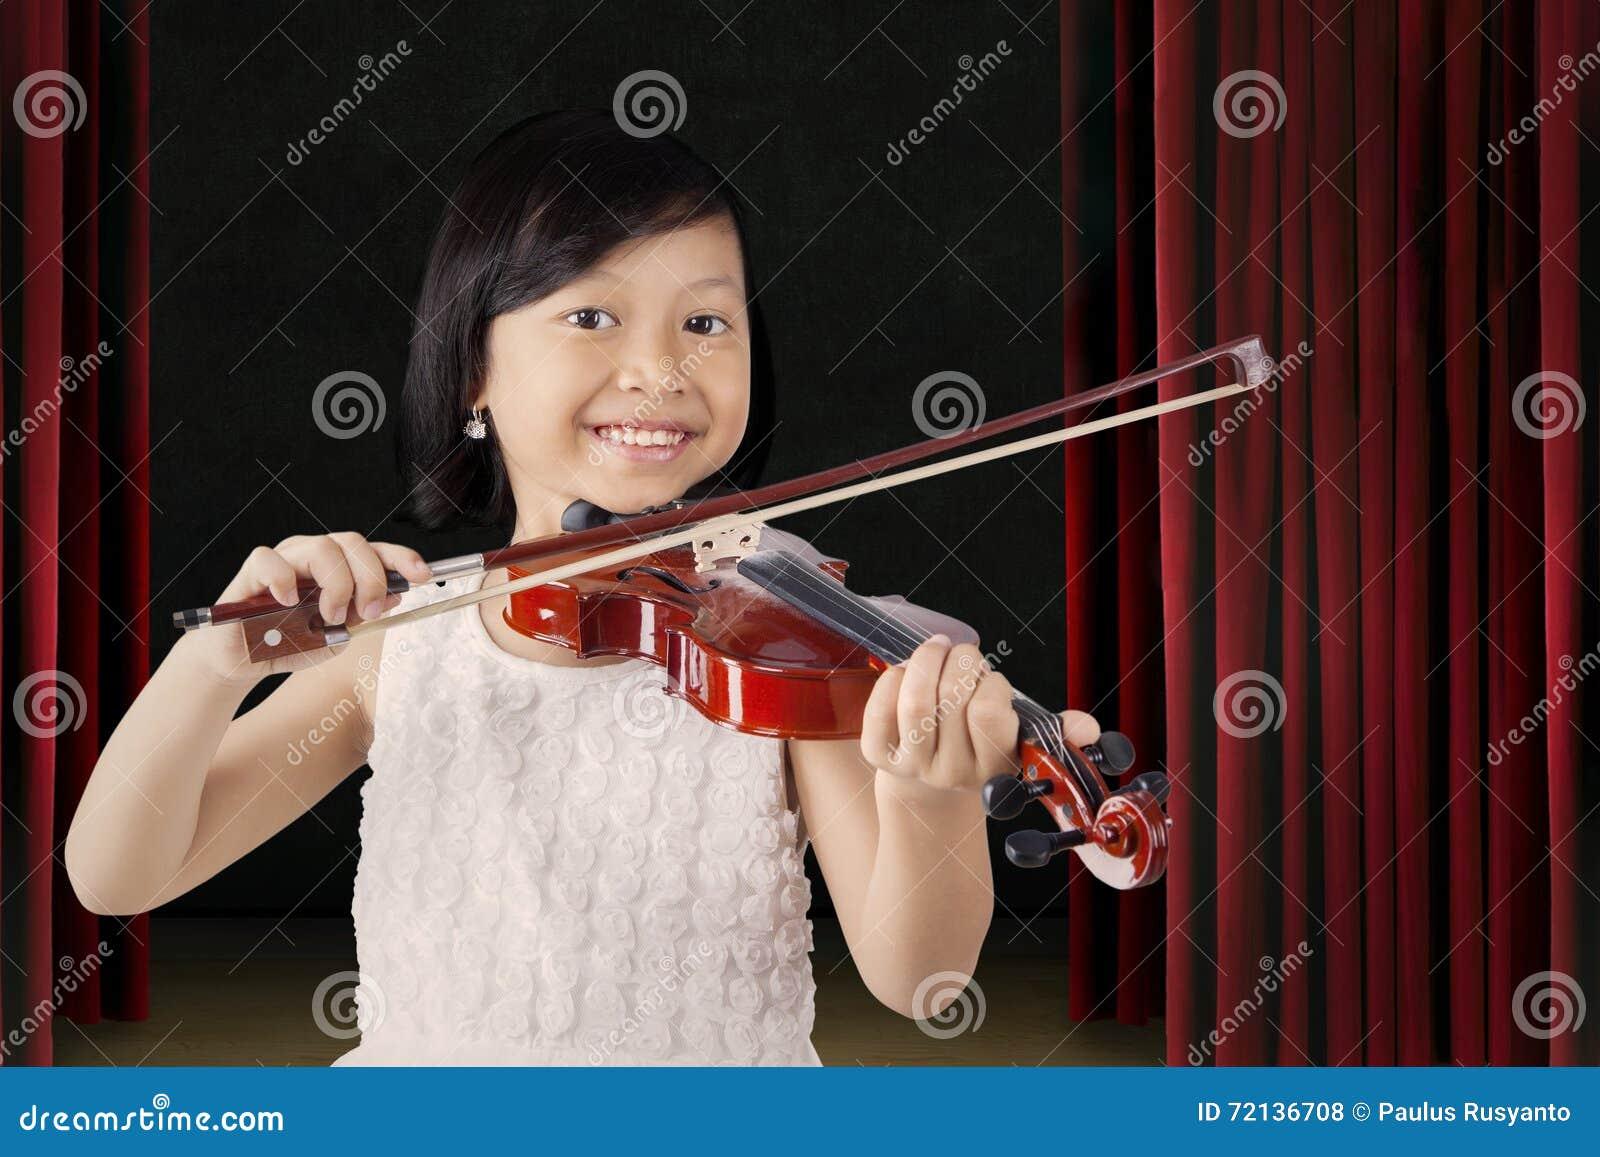 La niña bonita toca el violín en la etapa